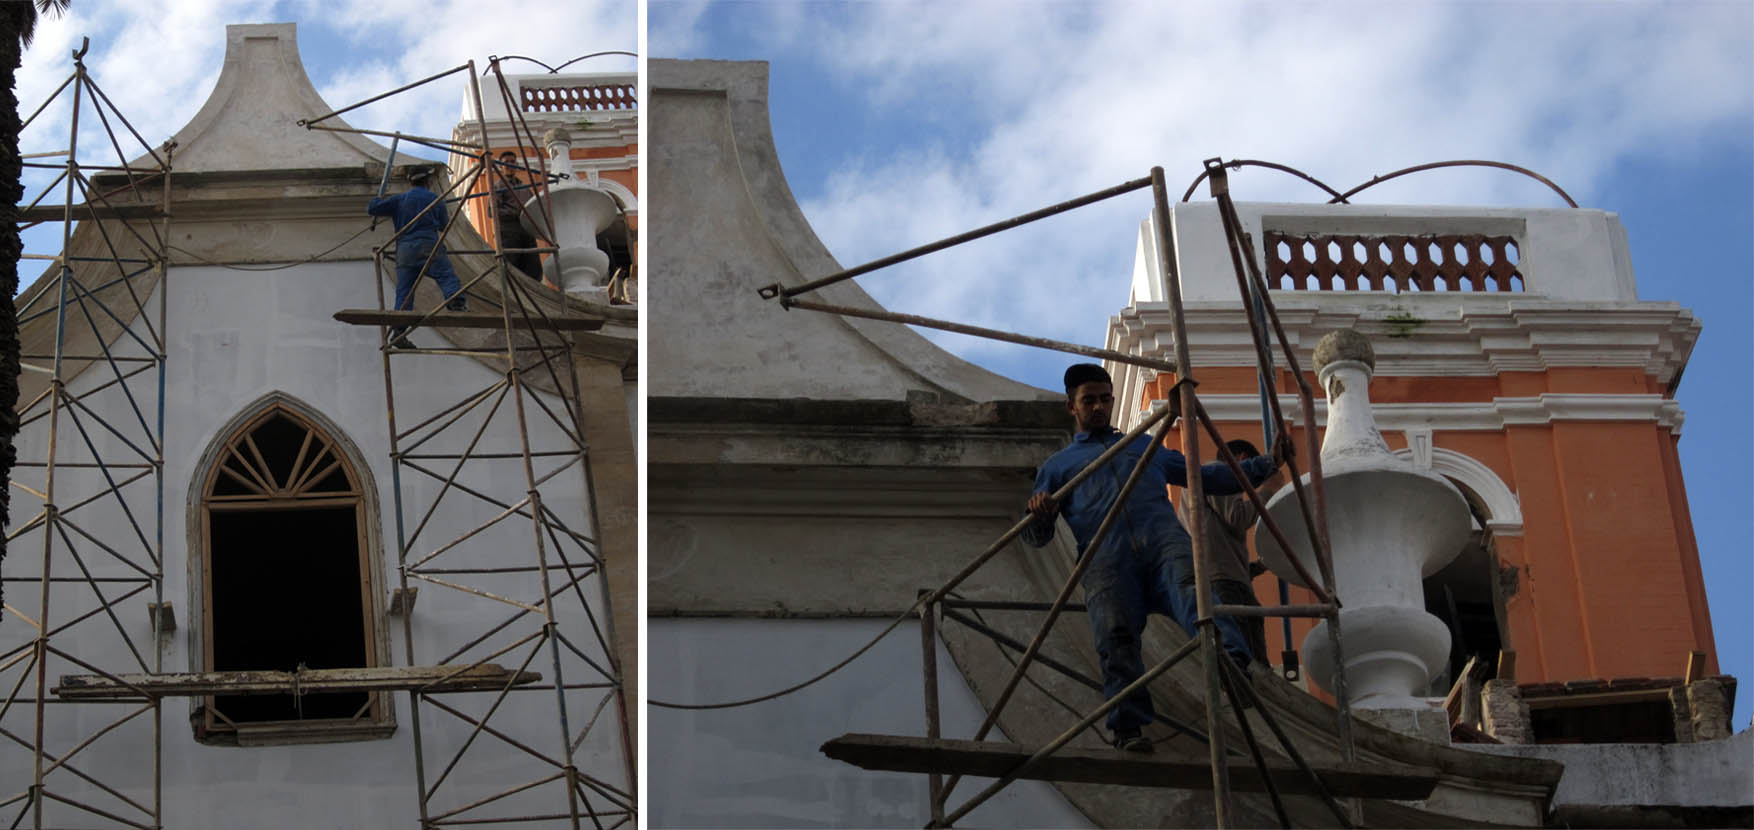 69 maroko kazablanka medina restauracija spanske crkve san buena ventura